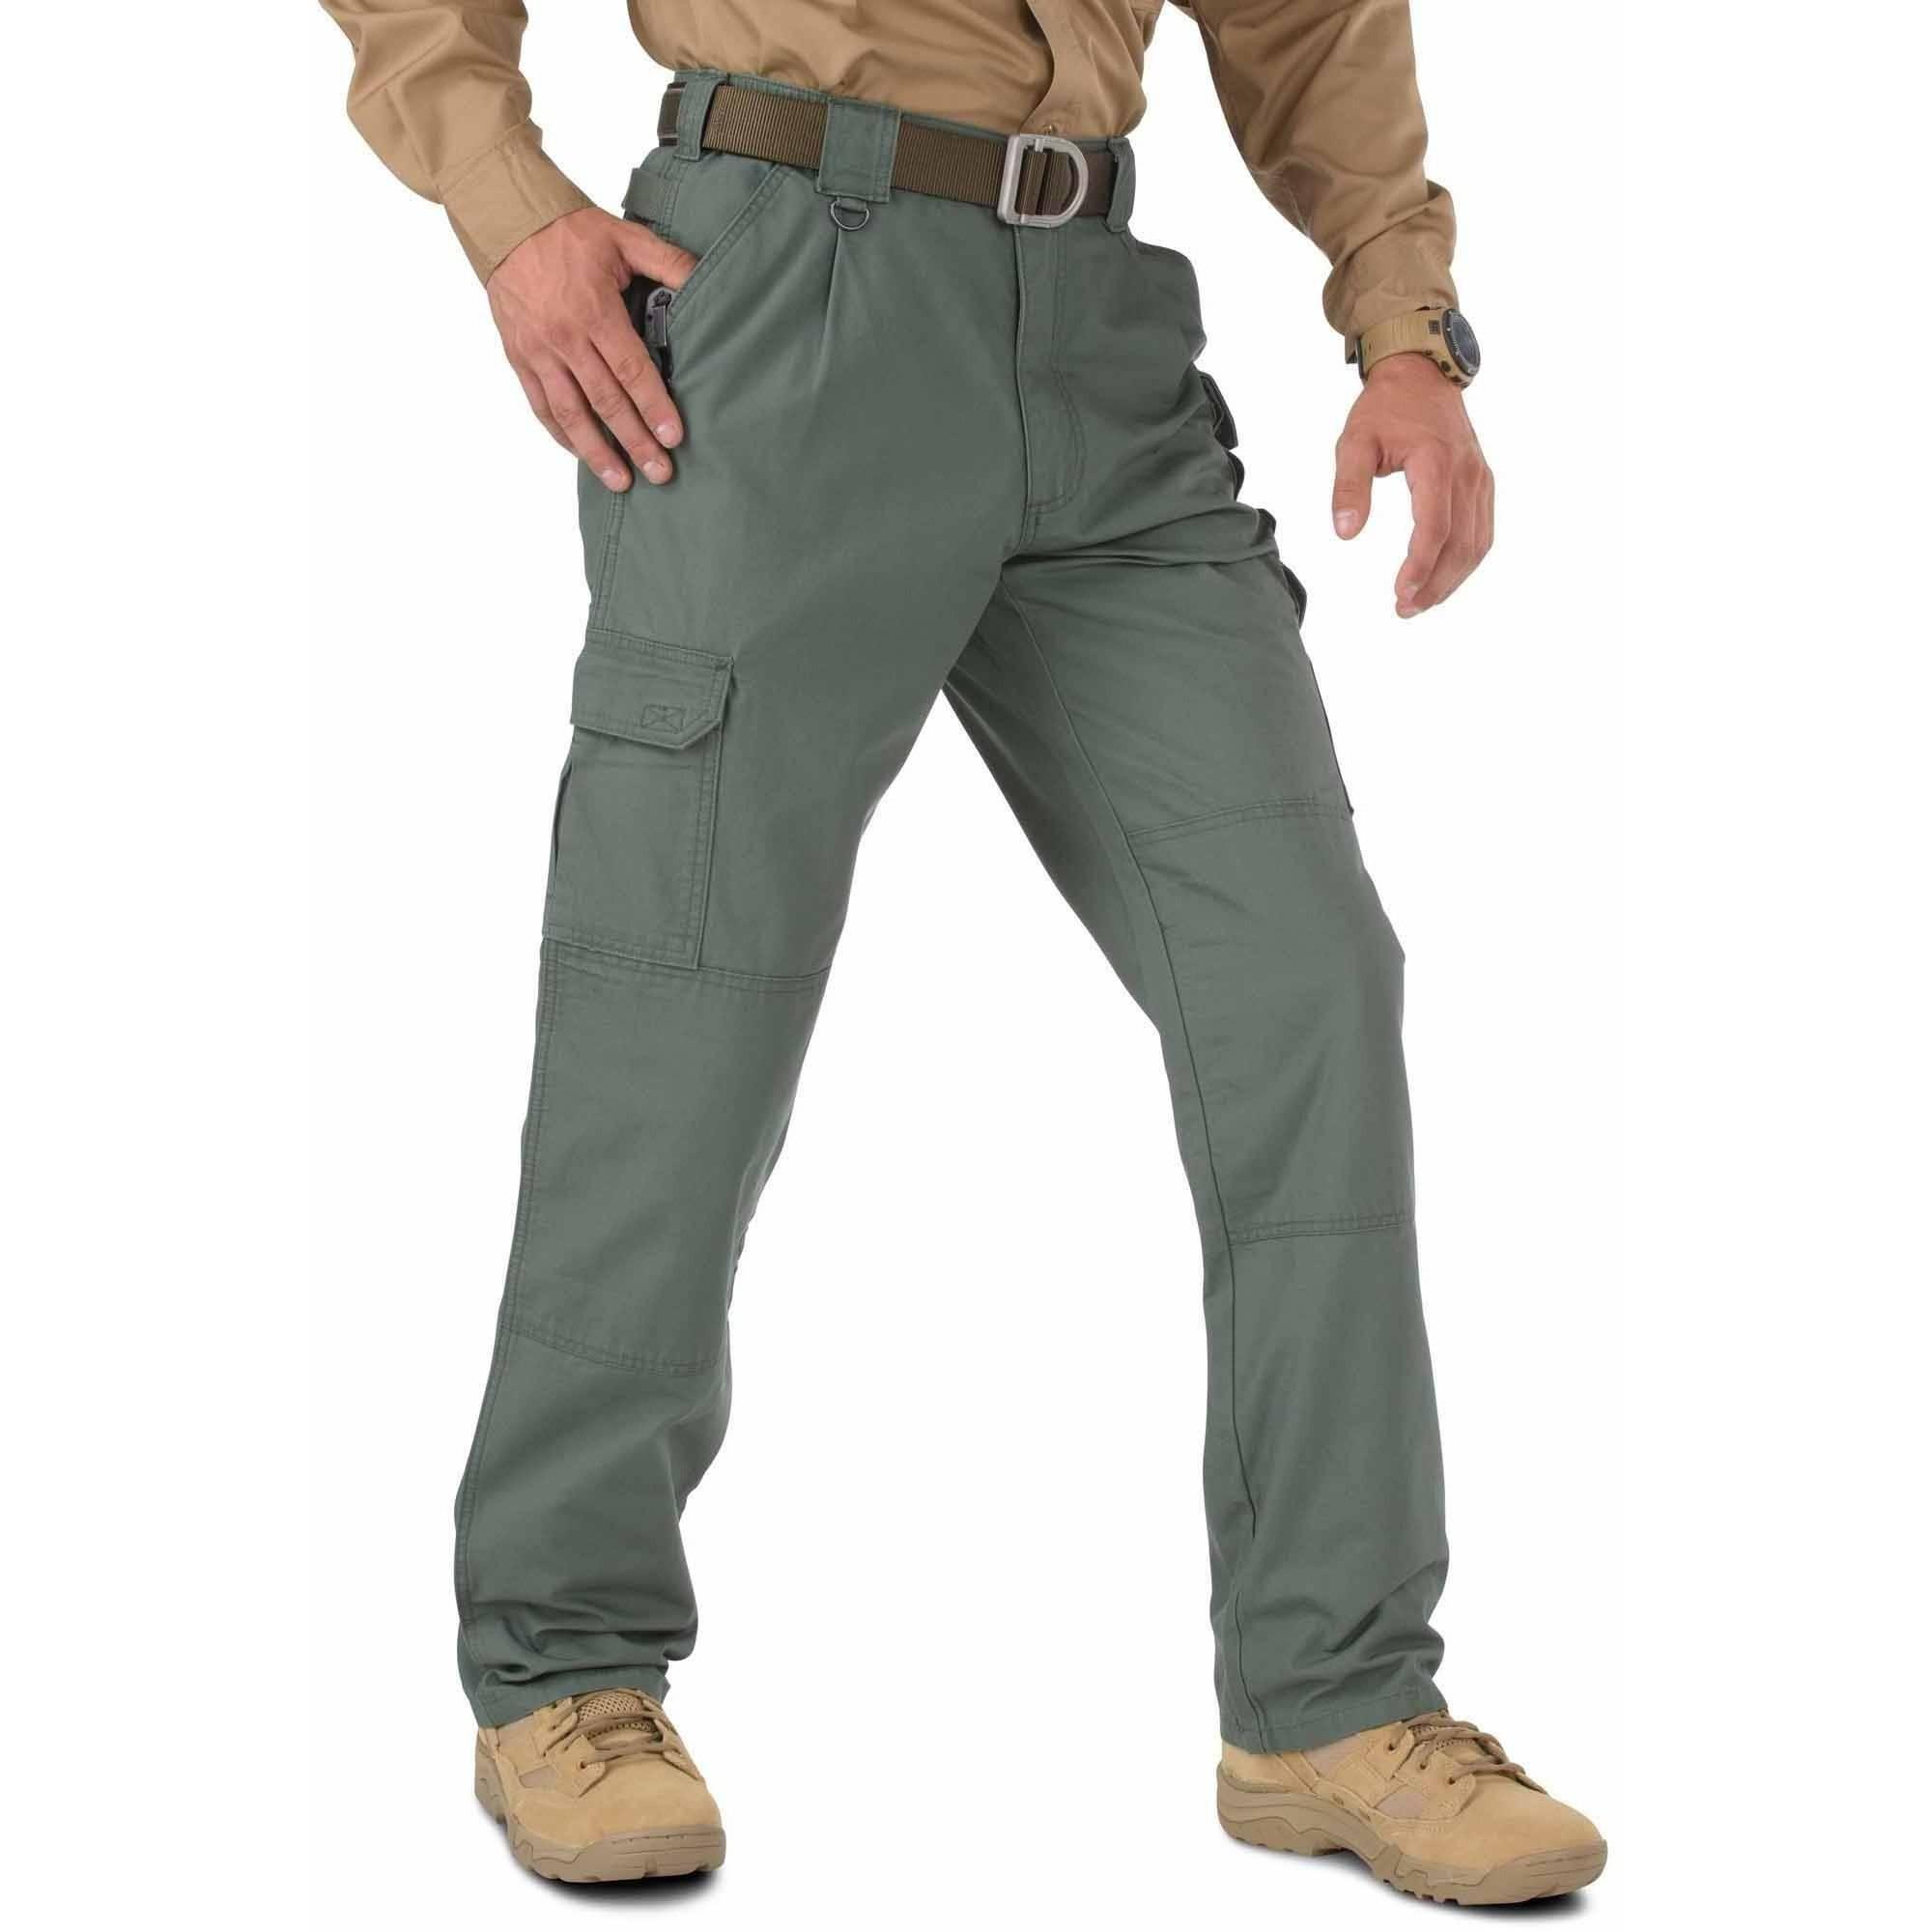 Men's Cotton Tactical Pant, OD Green